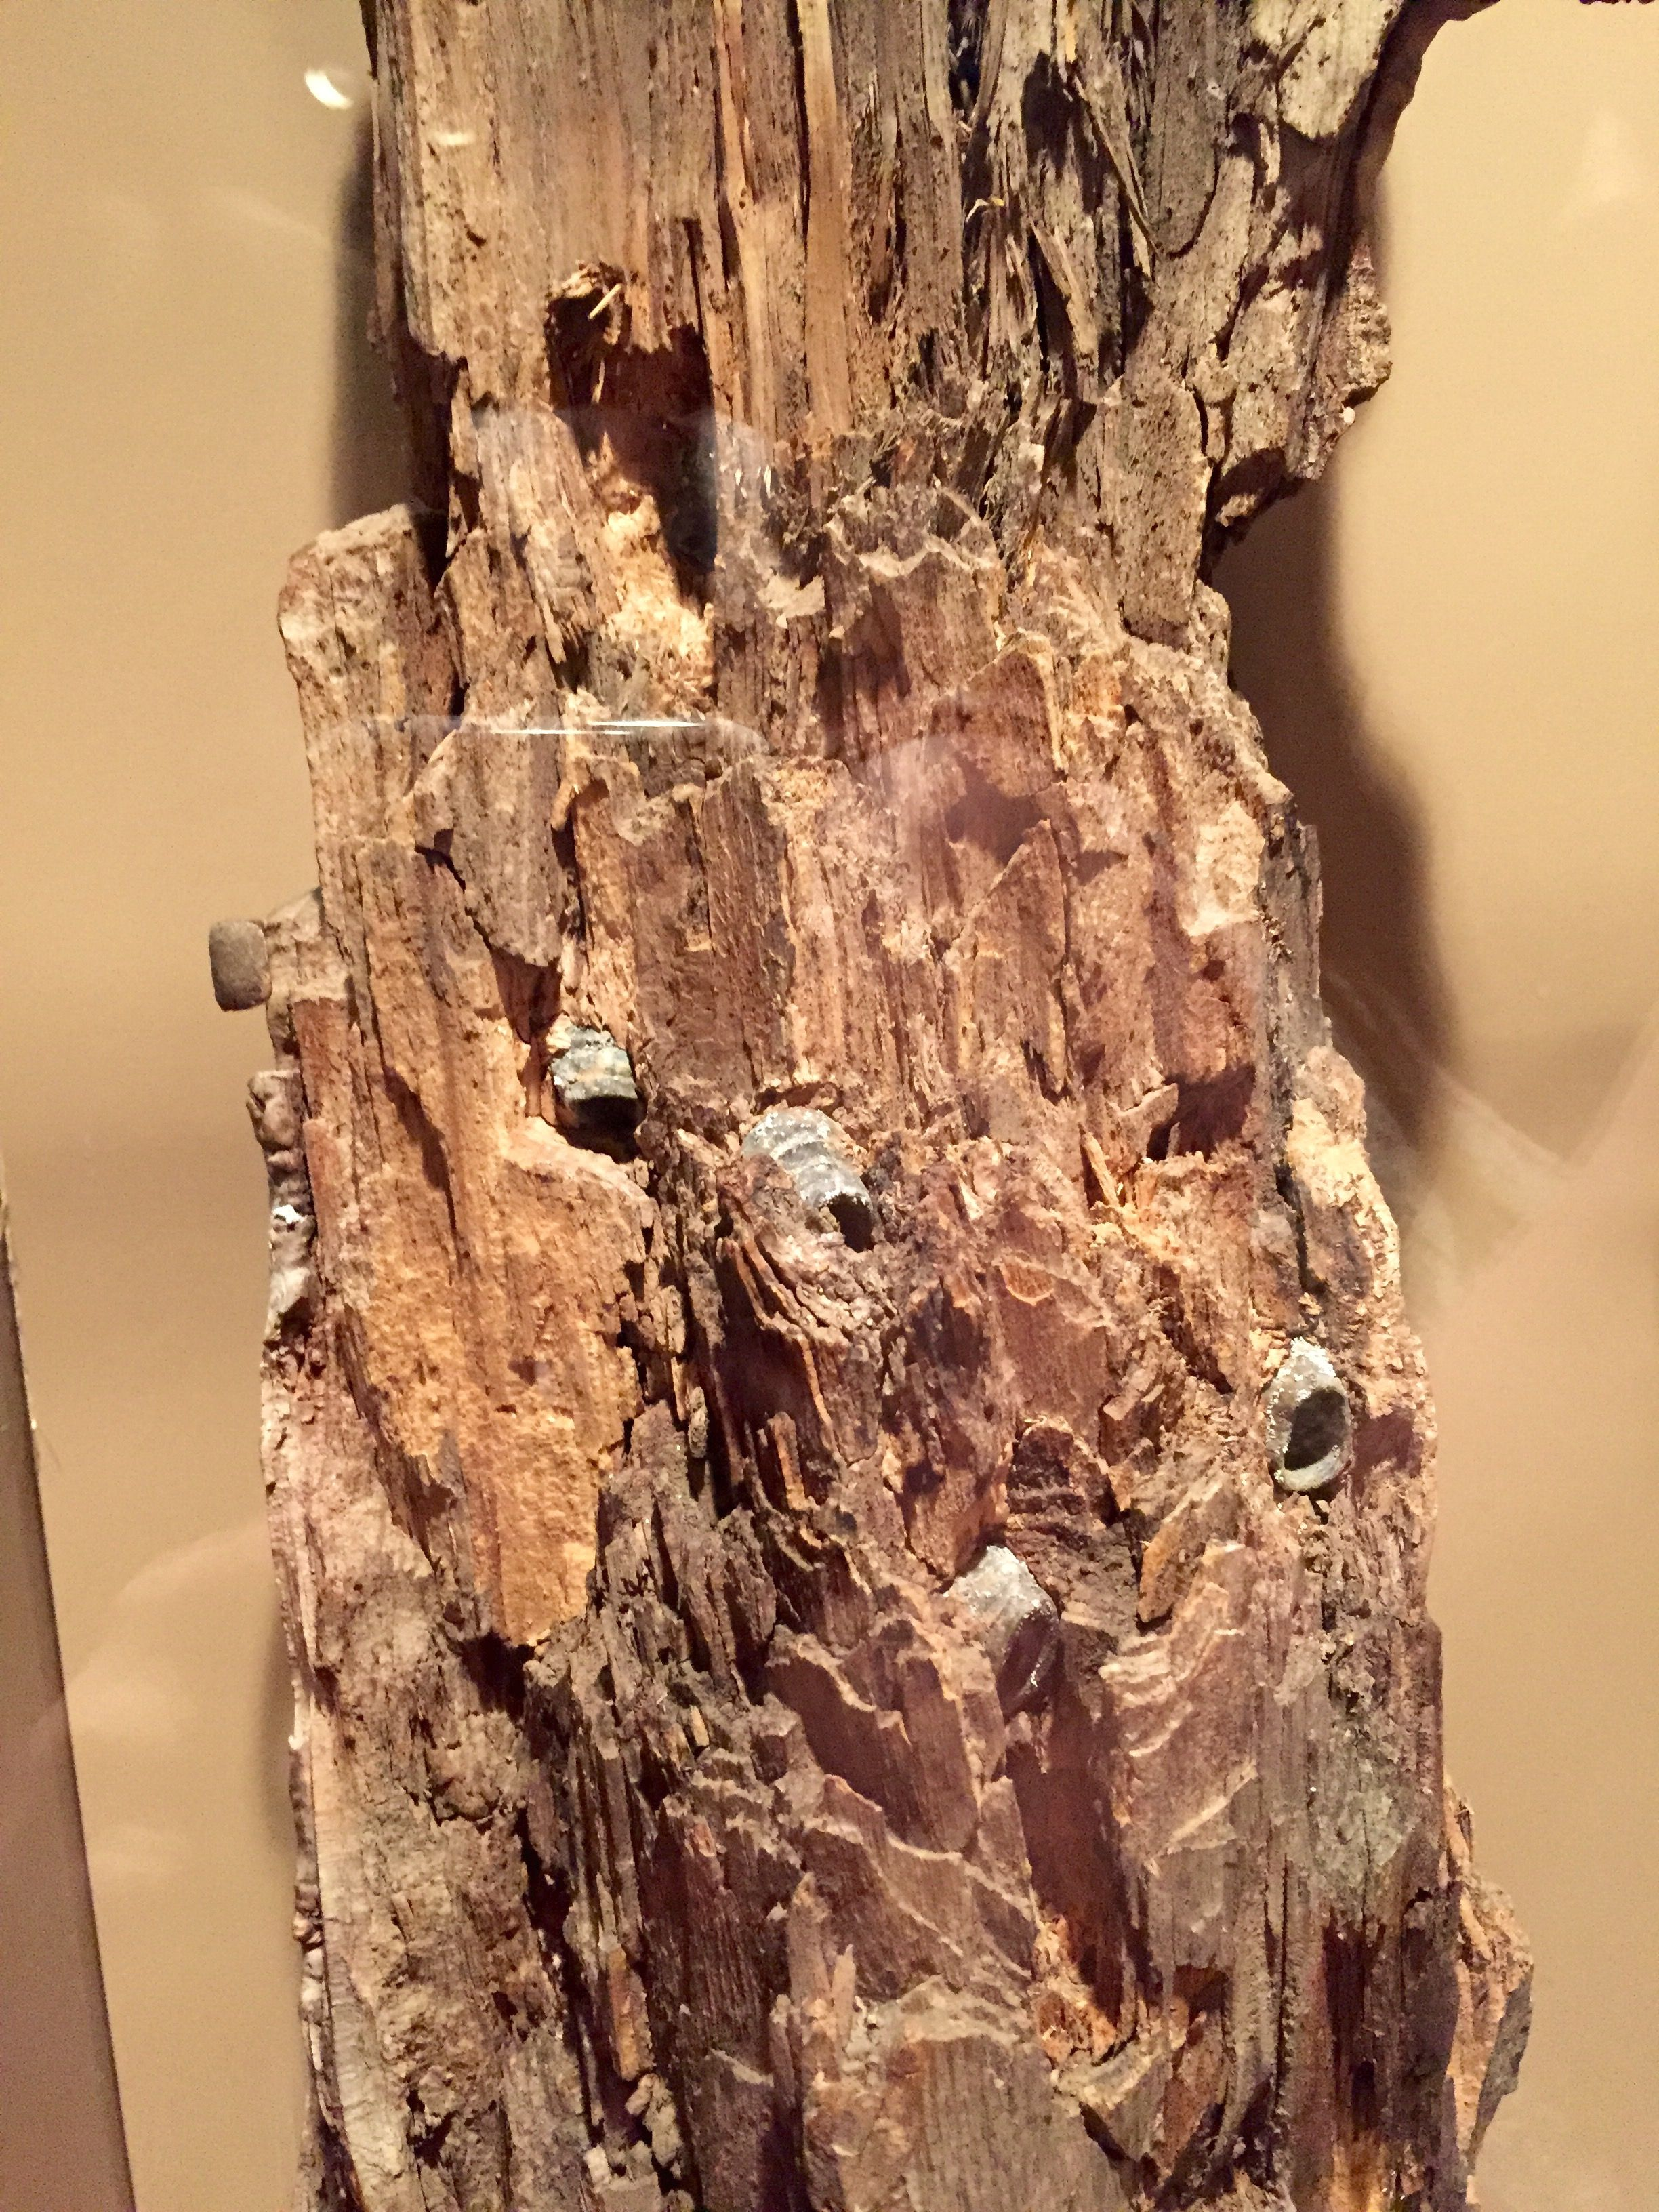 Atlanta Historic Museum Bullet Ridden Tree Stump With Civil War